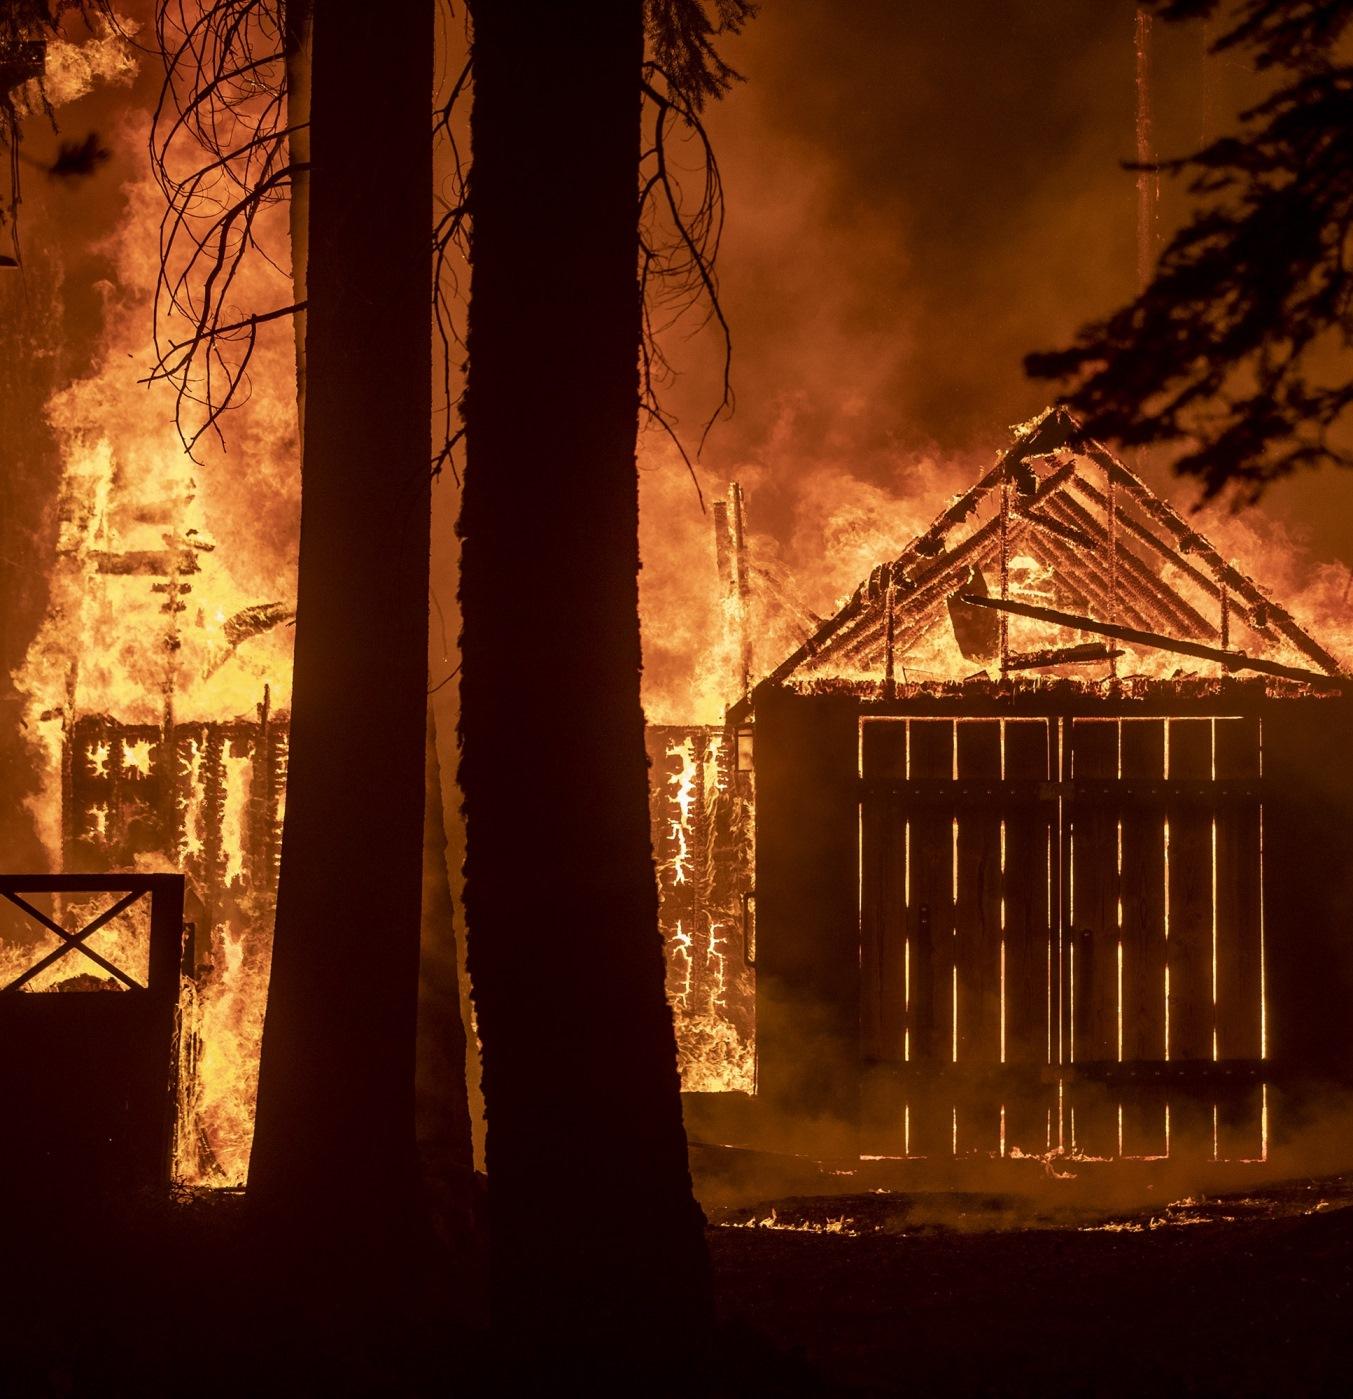 caldor fire incendio california evacuazione